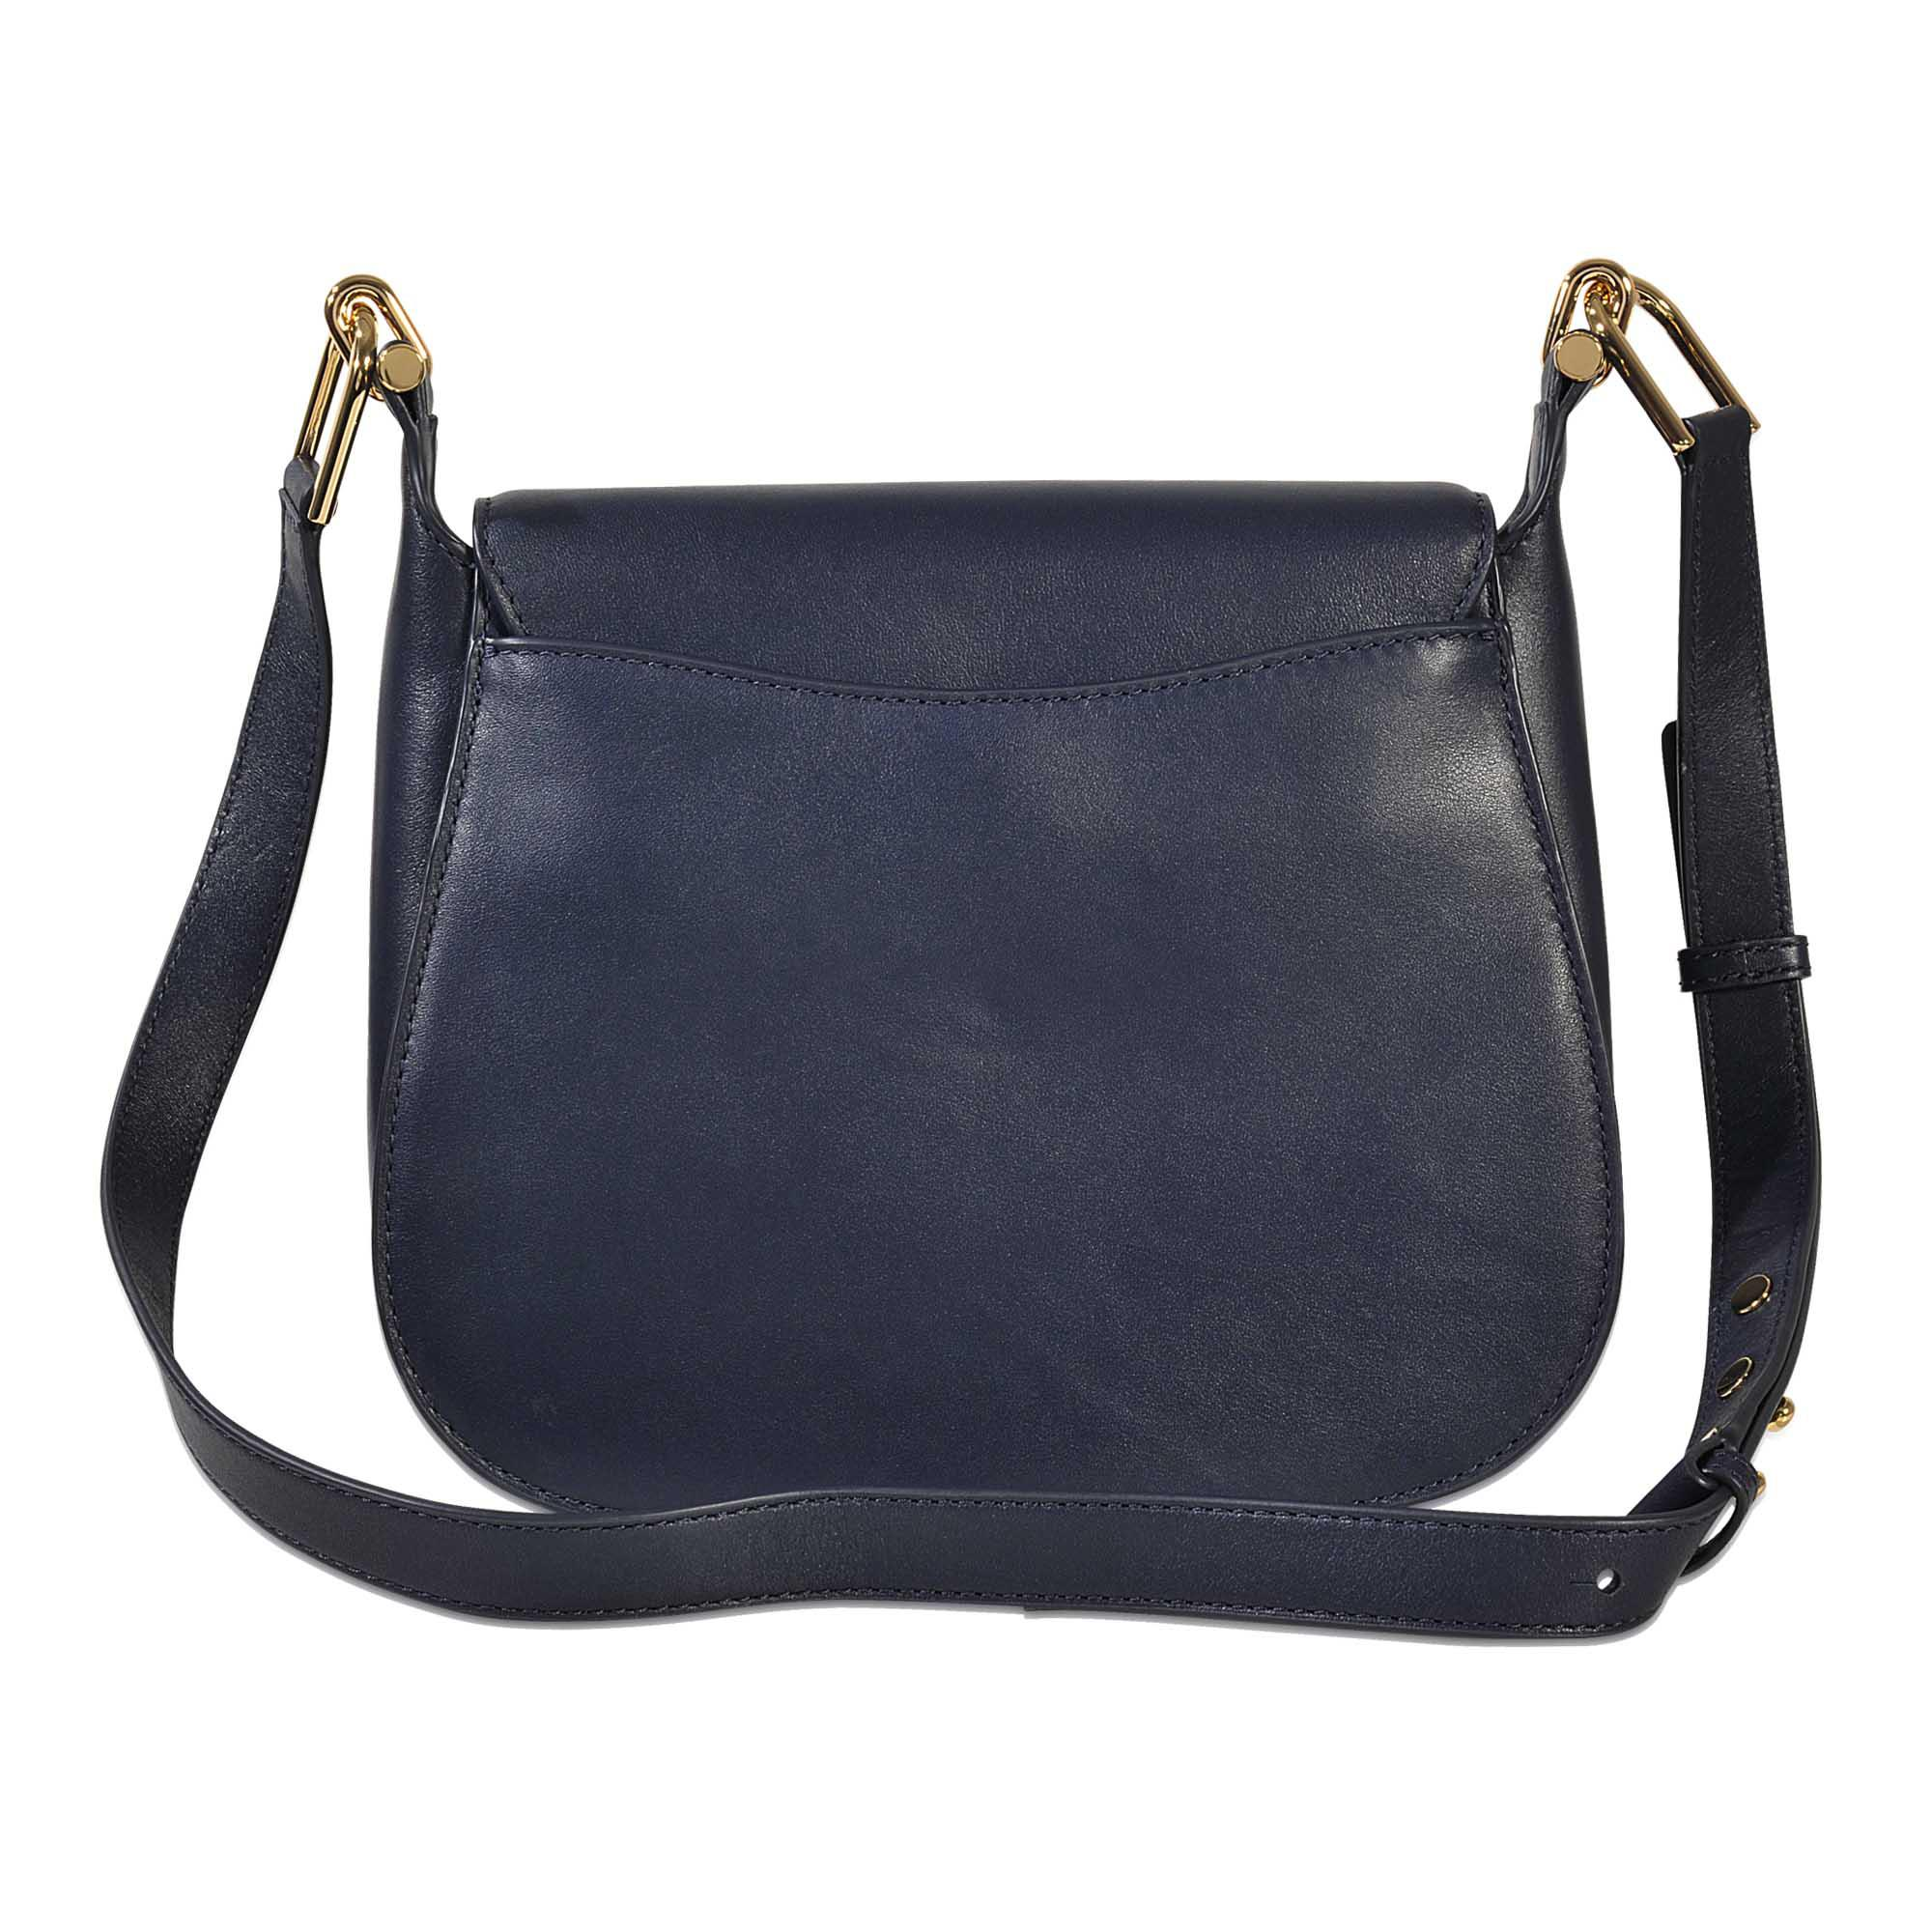 dbfb38ce0a57 Lyst - MICHAEL Michael Kors Delfina Large Saddle Bag in Blue